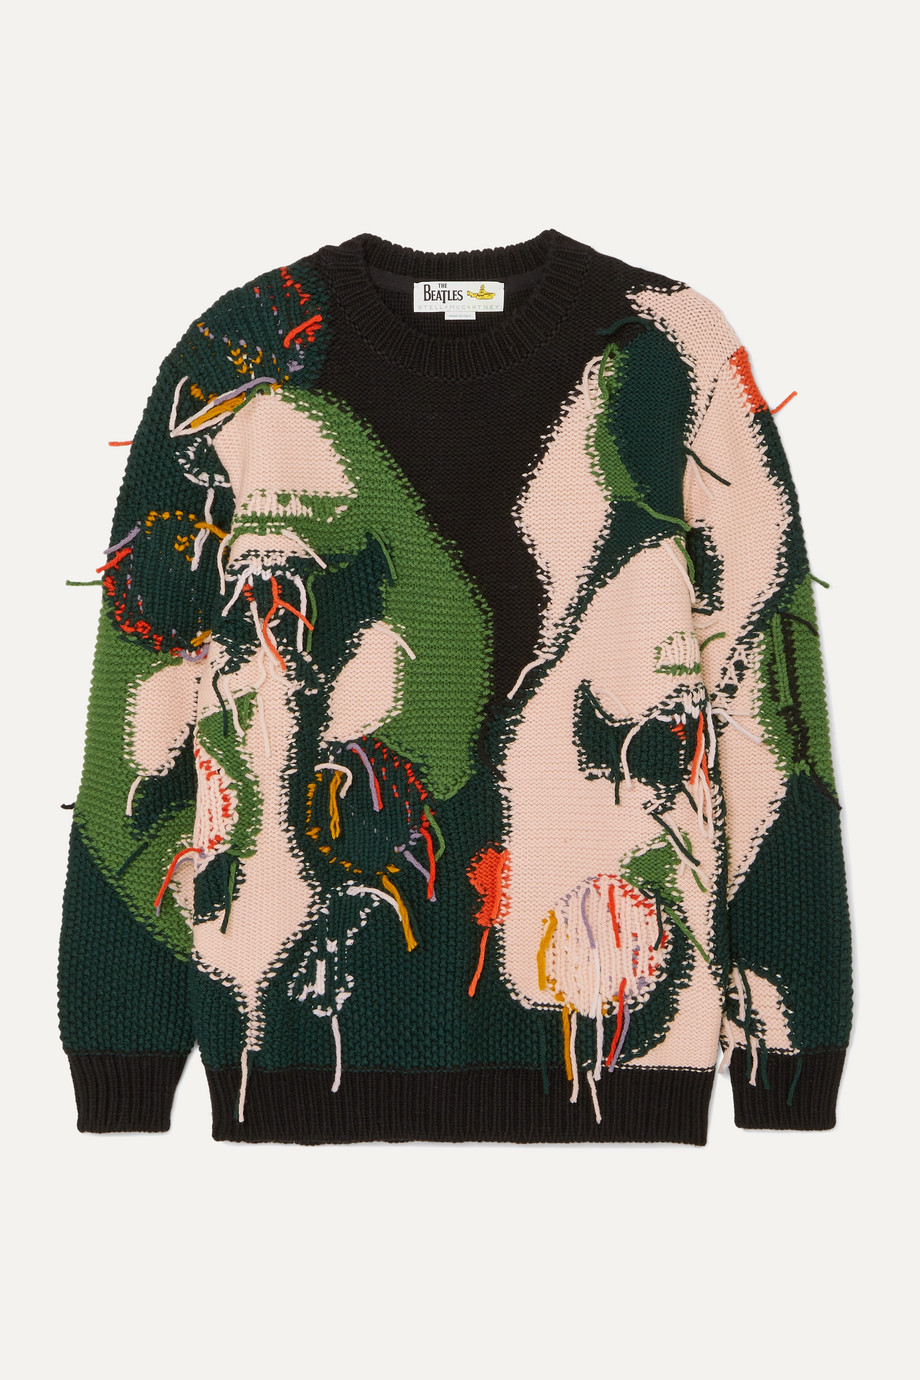 Stella McCartney + The Beatles intarsia wool sweater